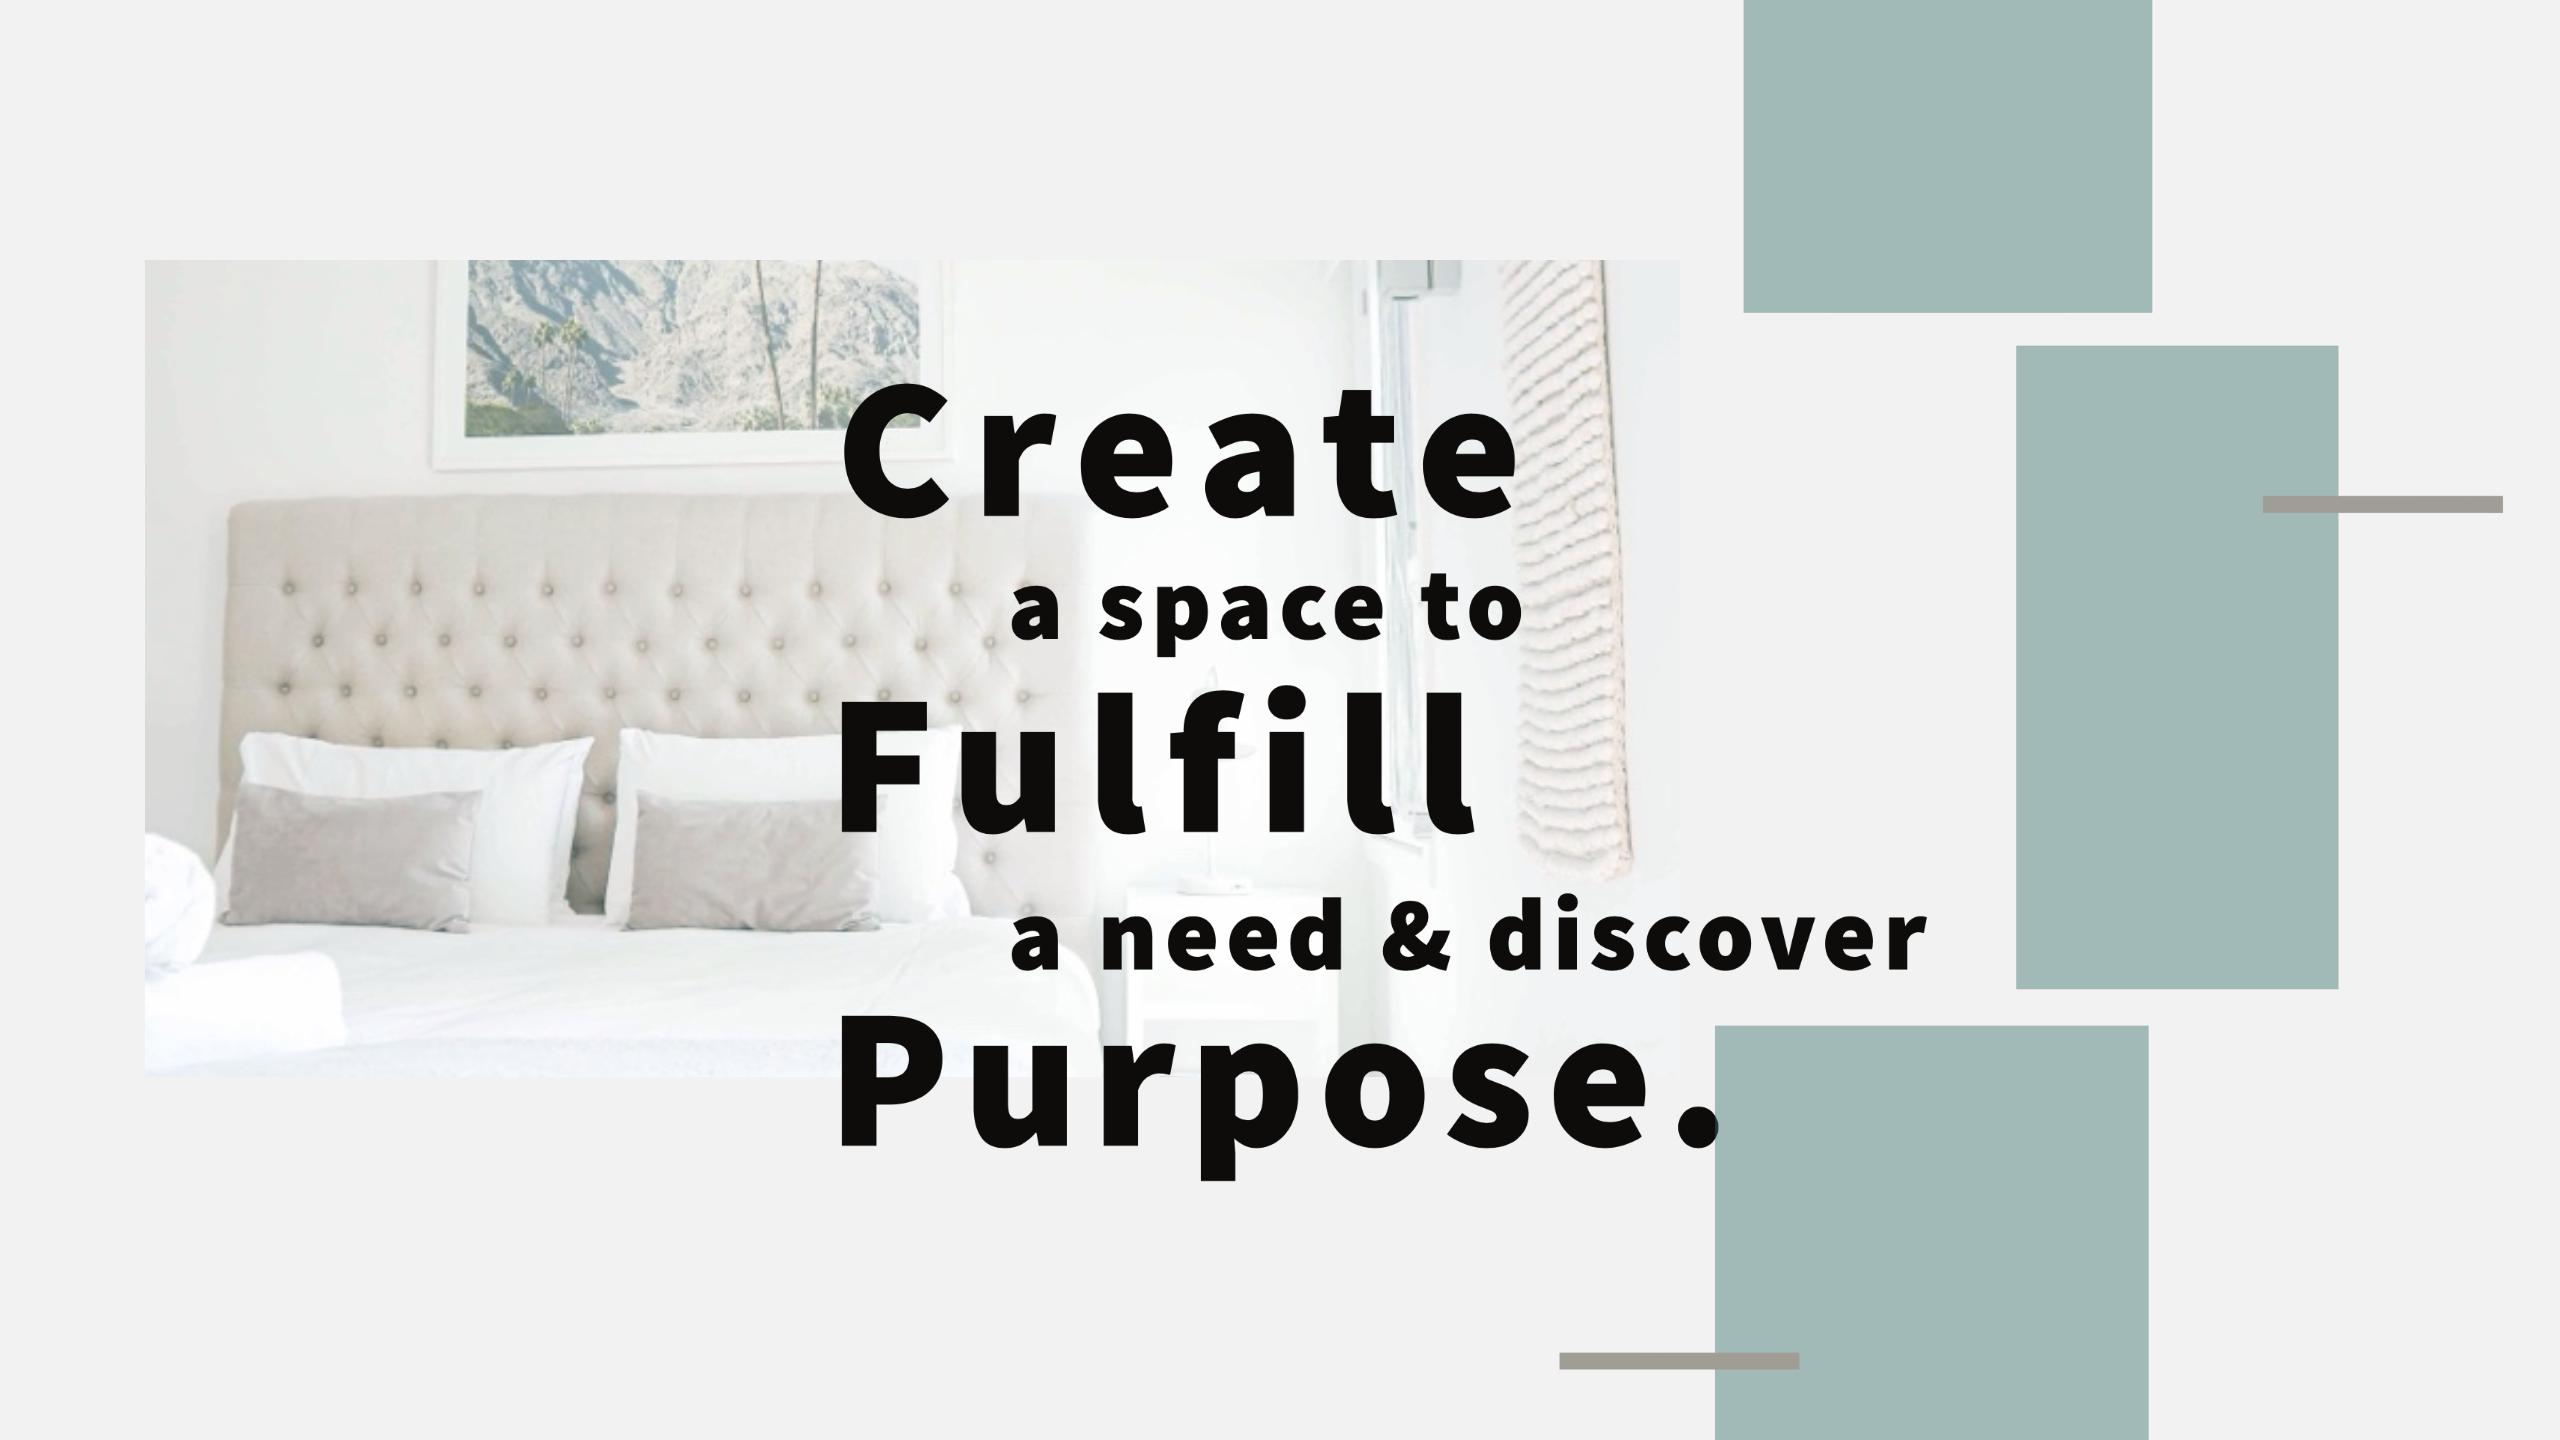 Create. Fulfill. Purpose.